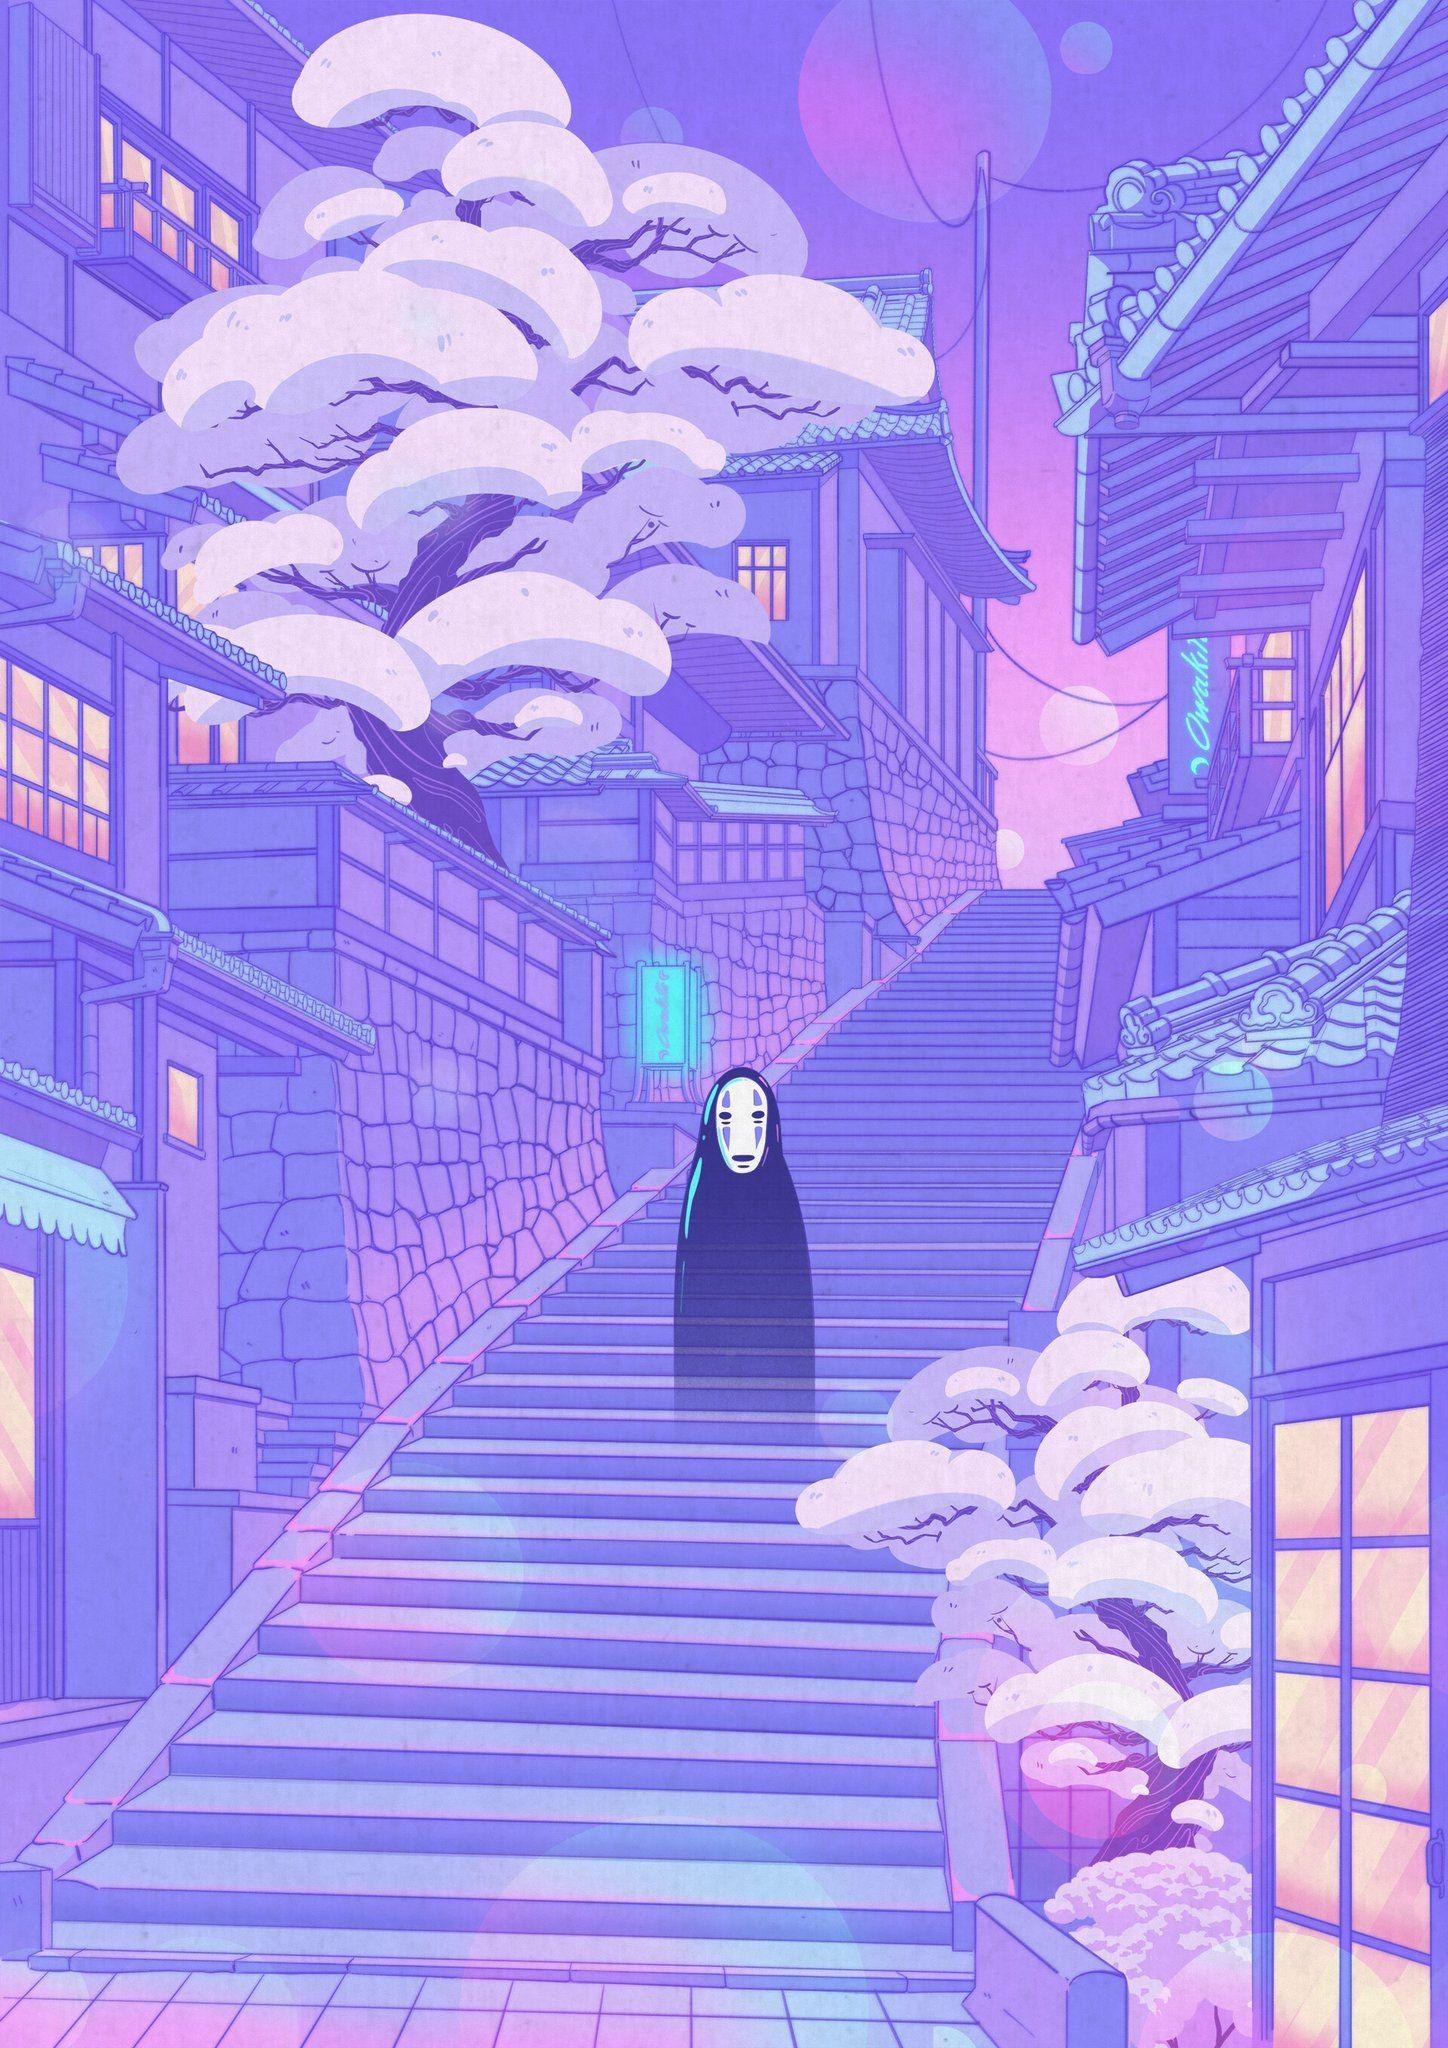 Twitter in 2020 Anime scenery wallpaper, Anime scenery